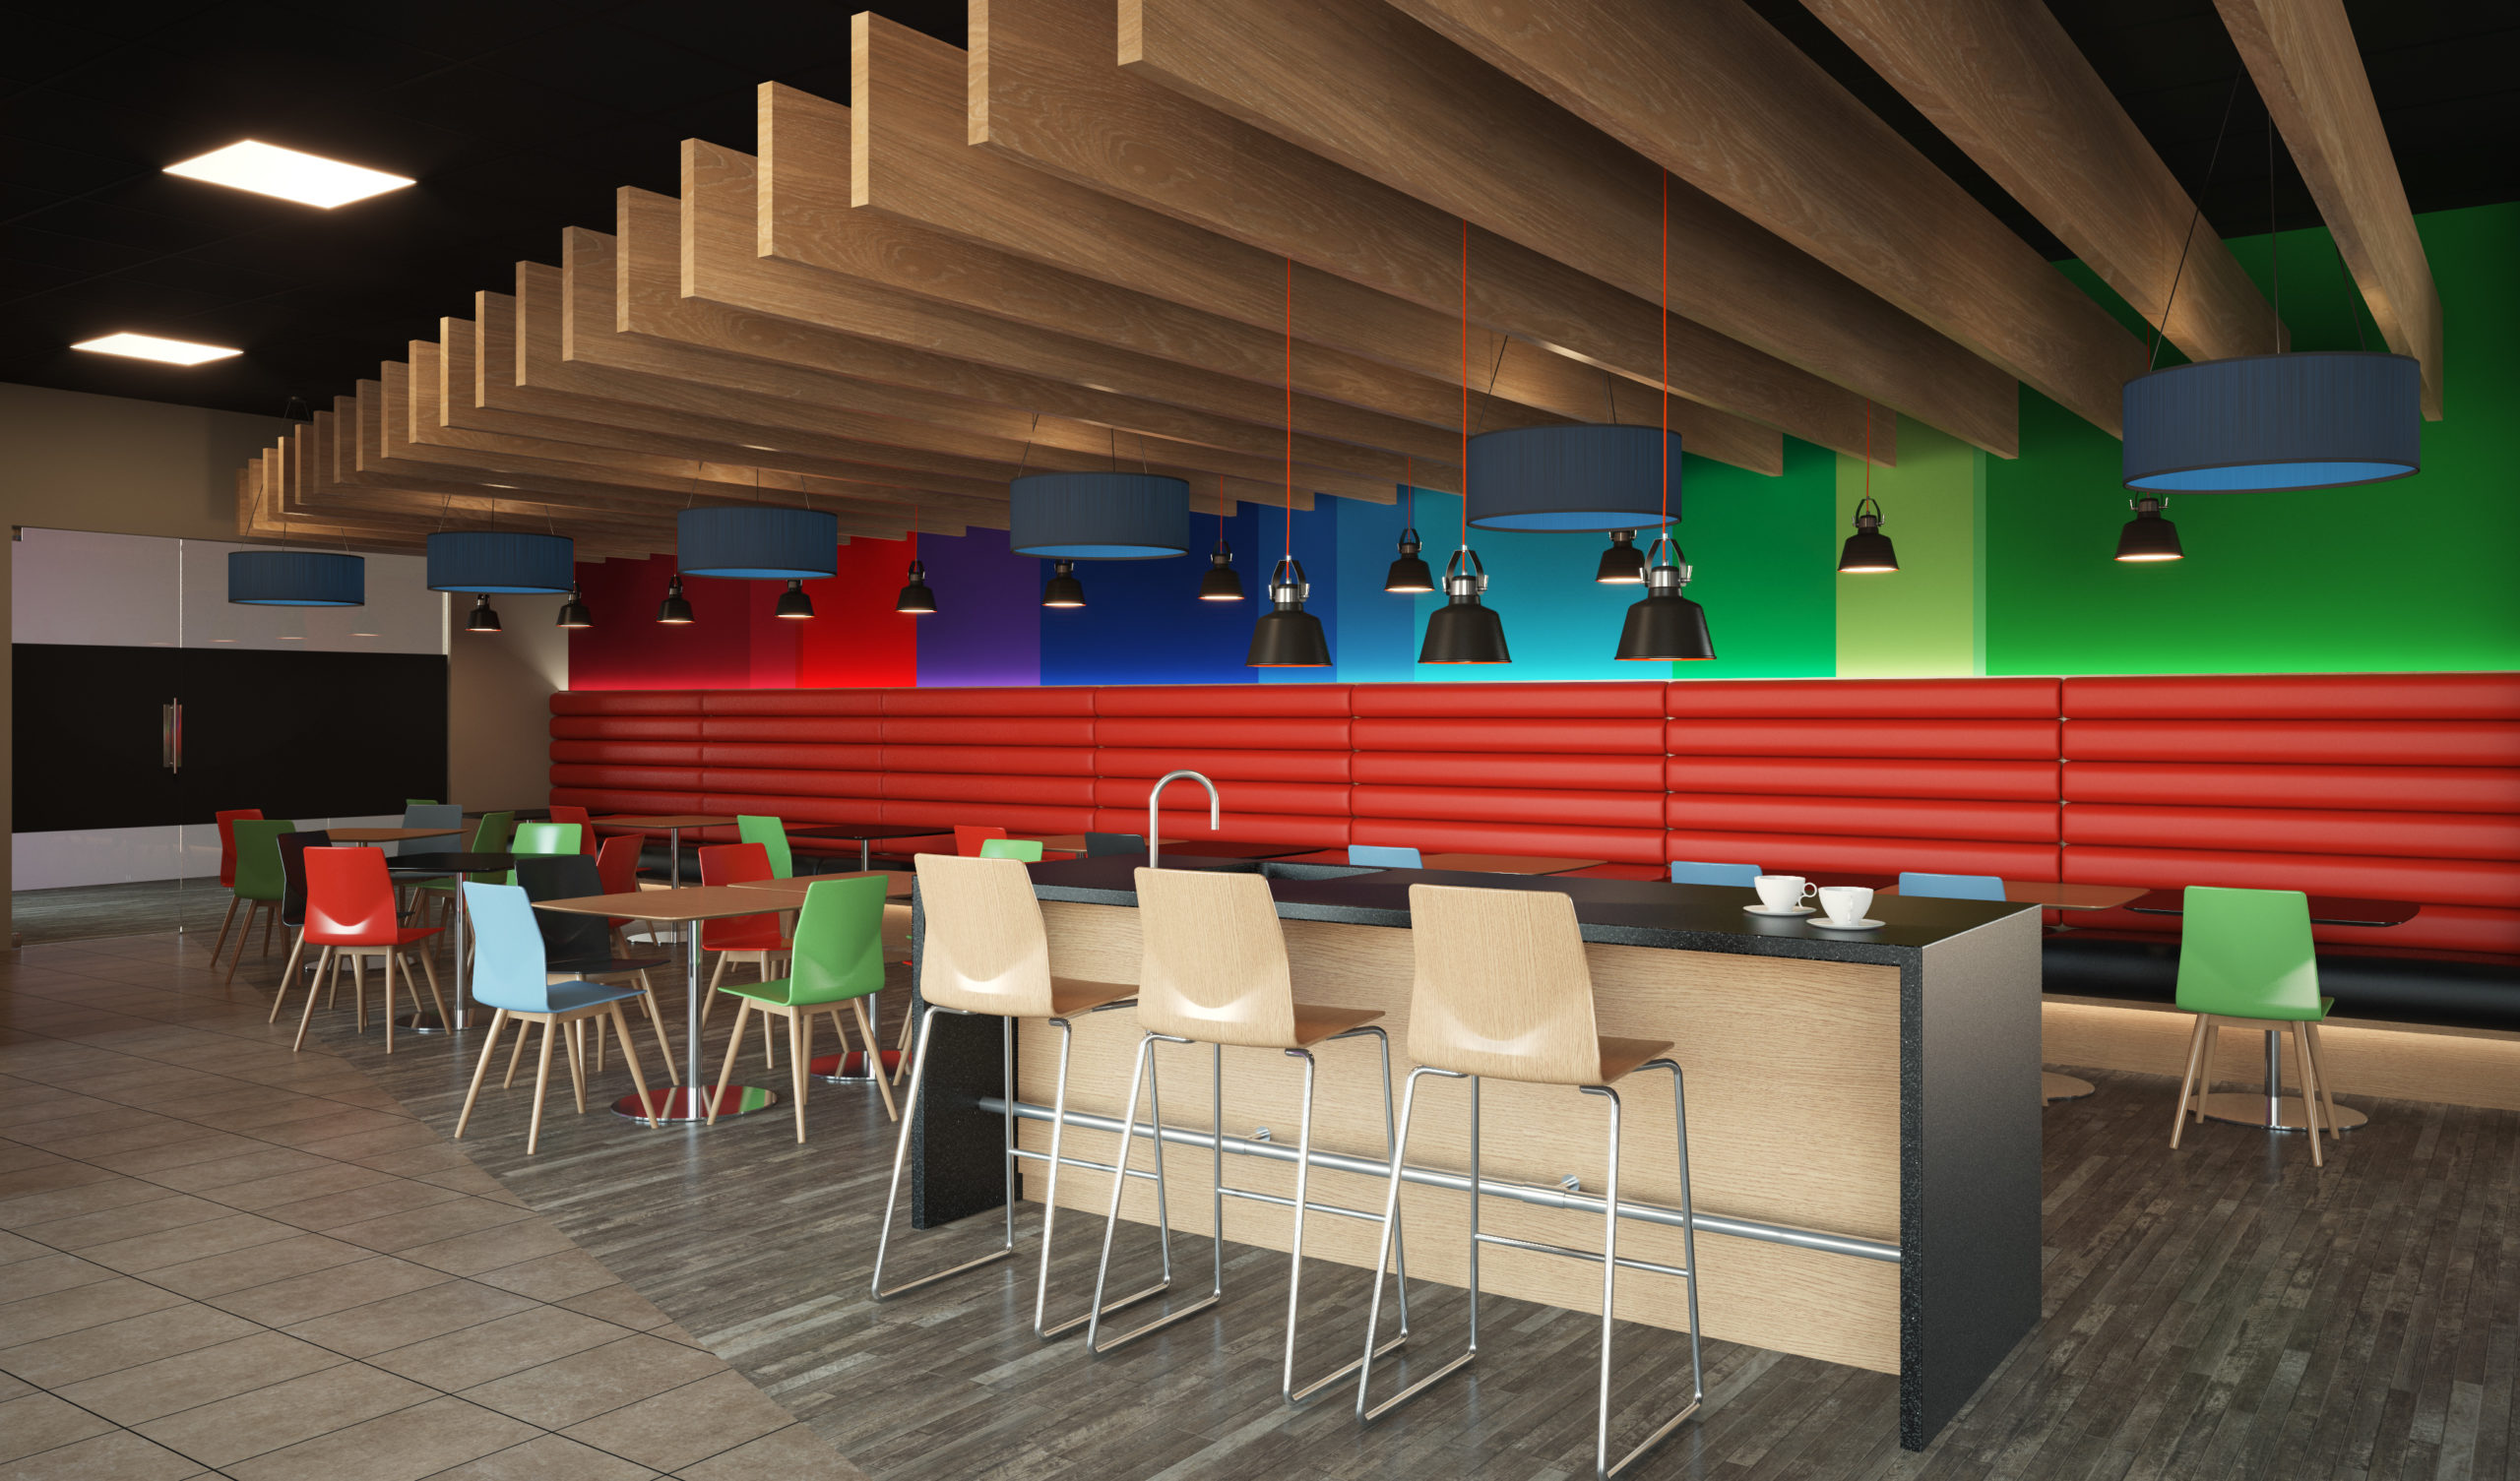 photorealistic-office-interior-design-visual-B